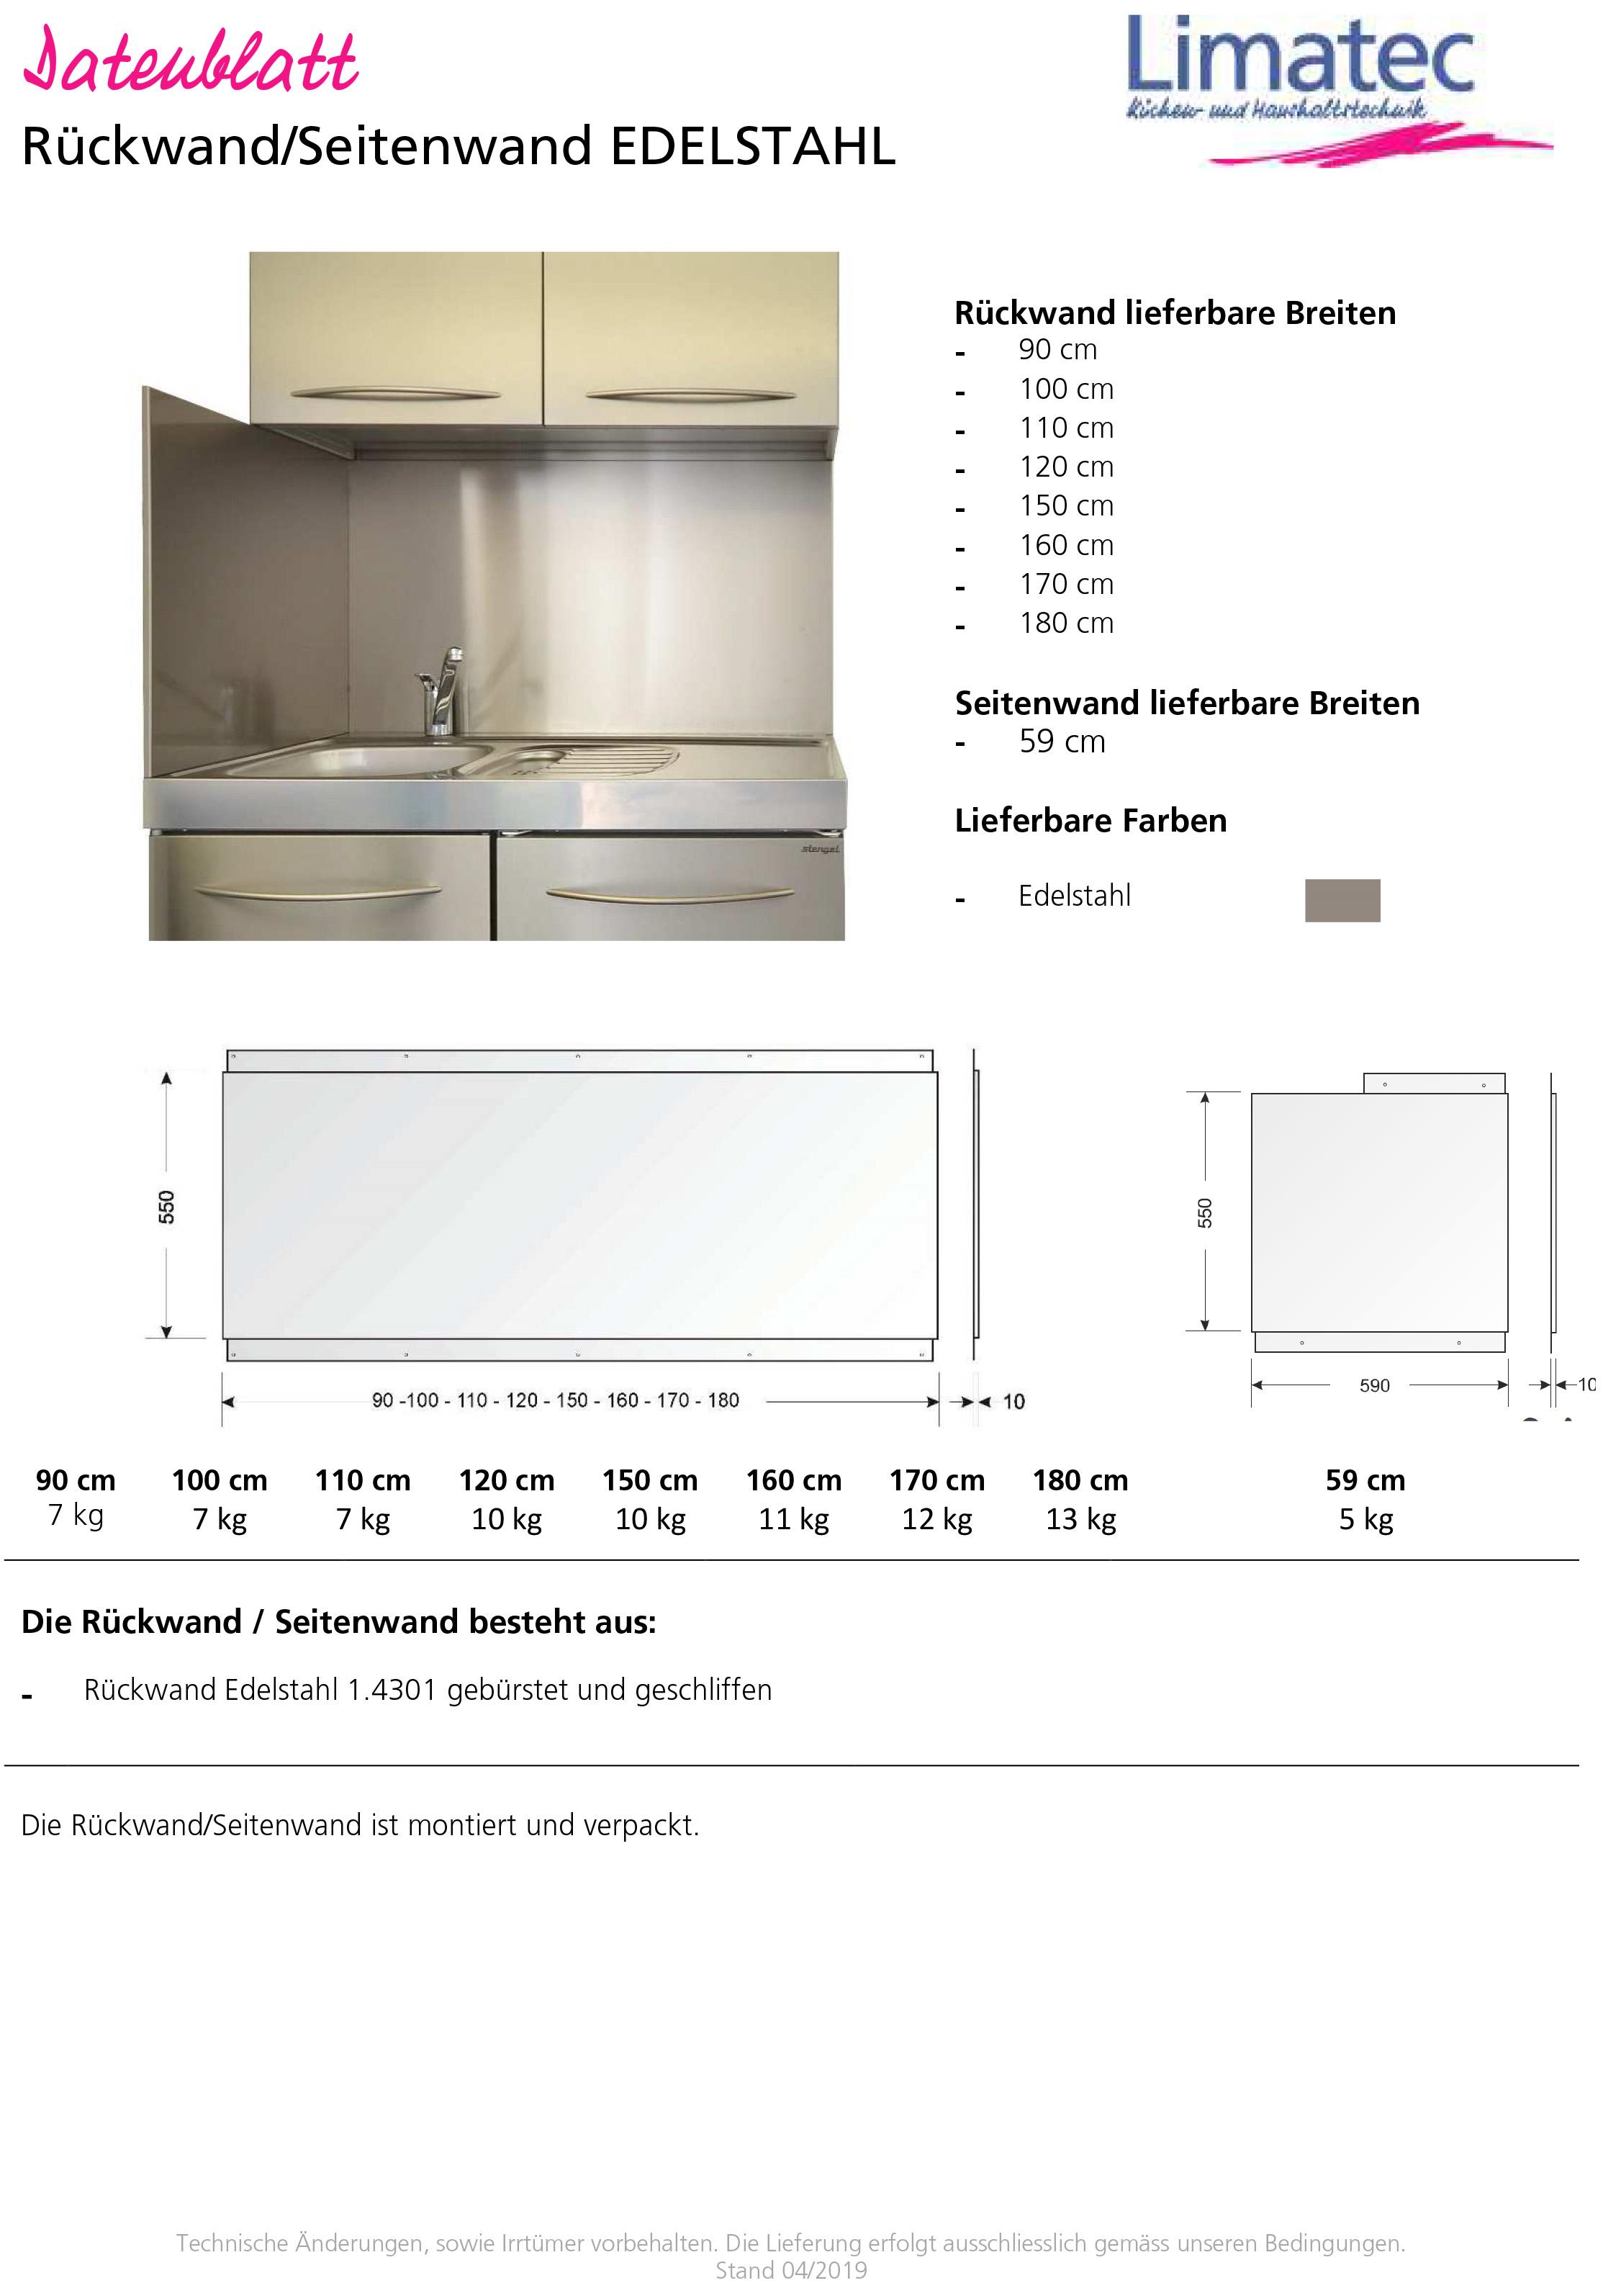 Rear panel/side panel